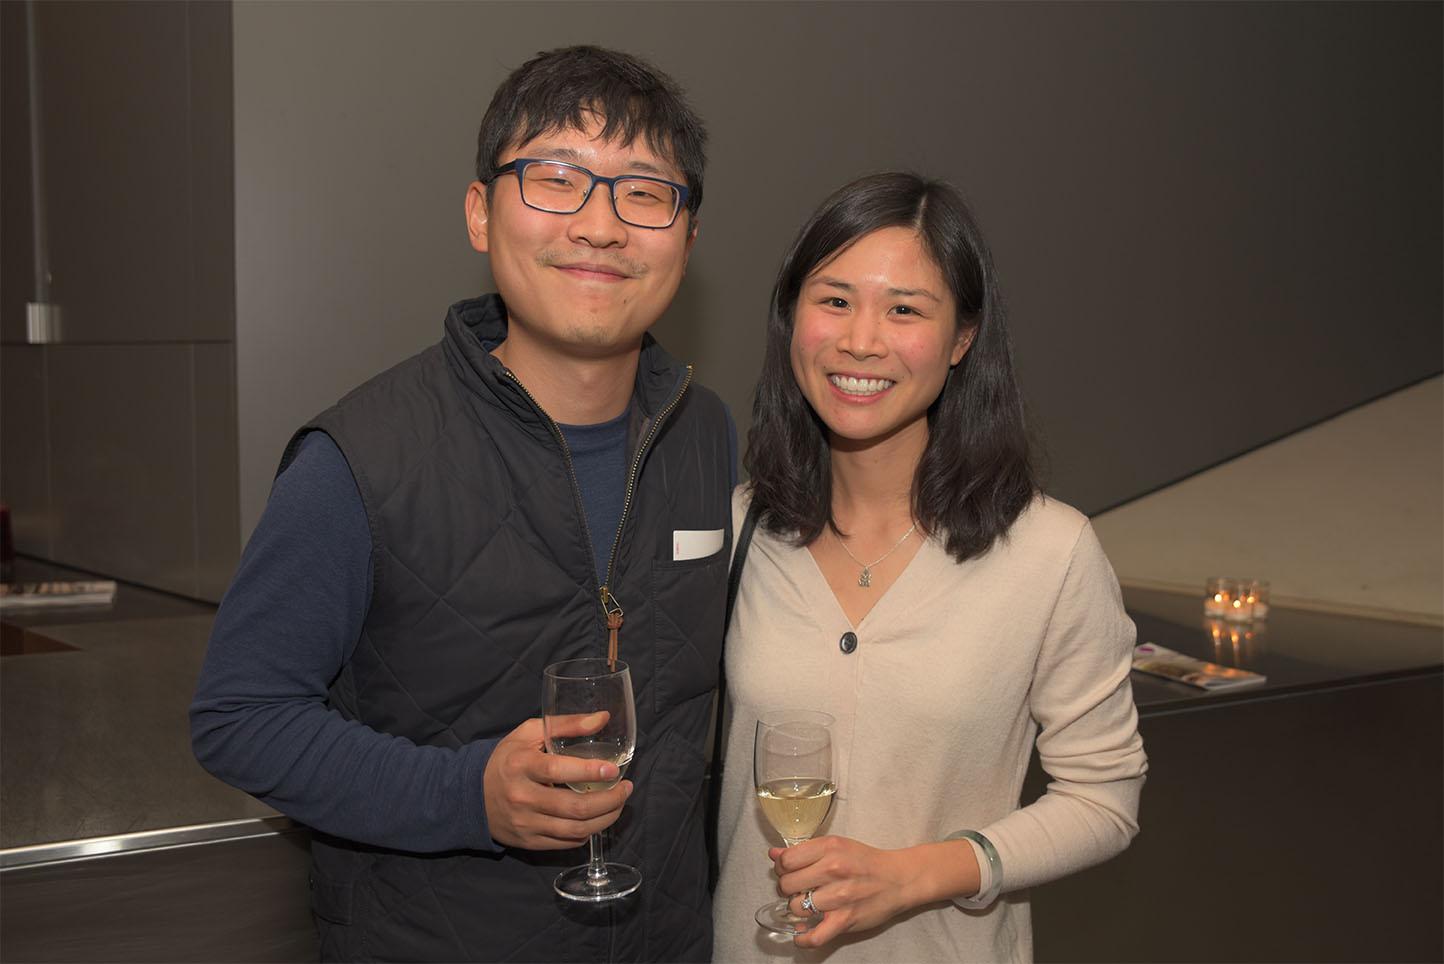 Joseph and Leanne Lim